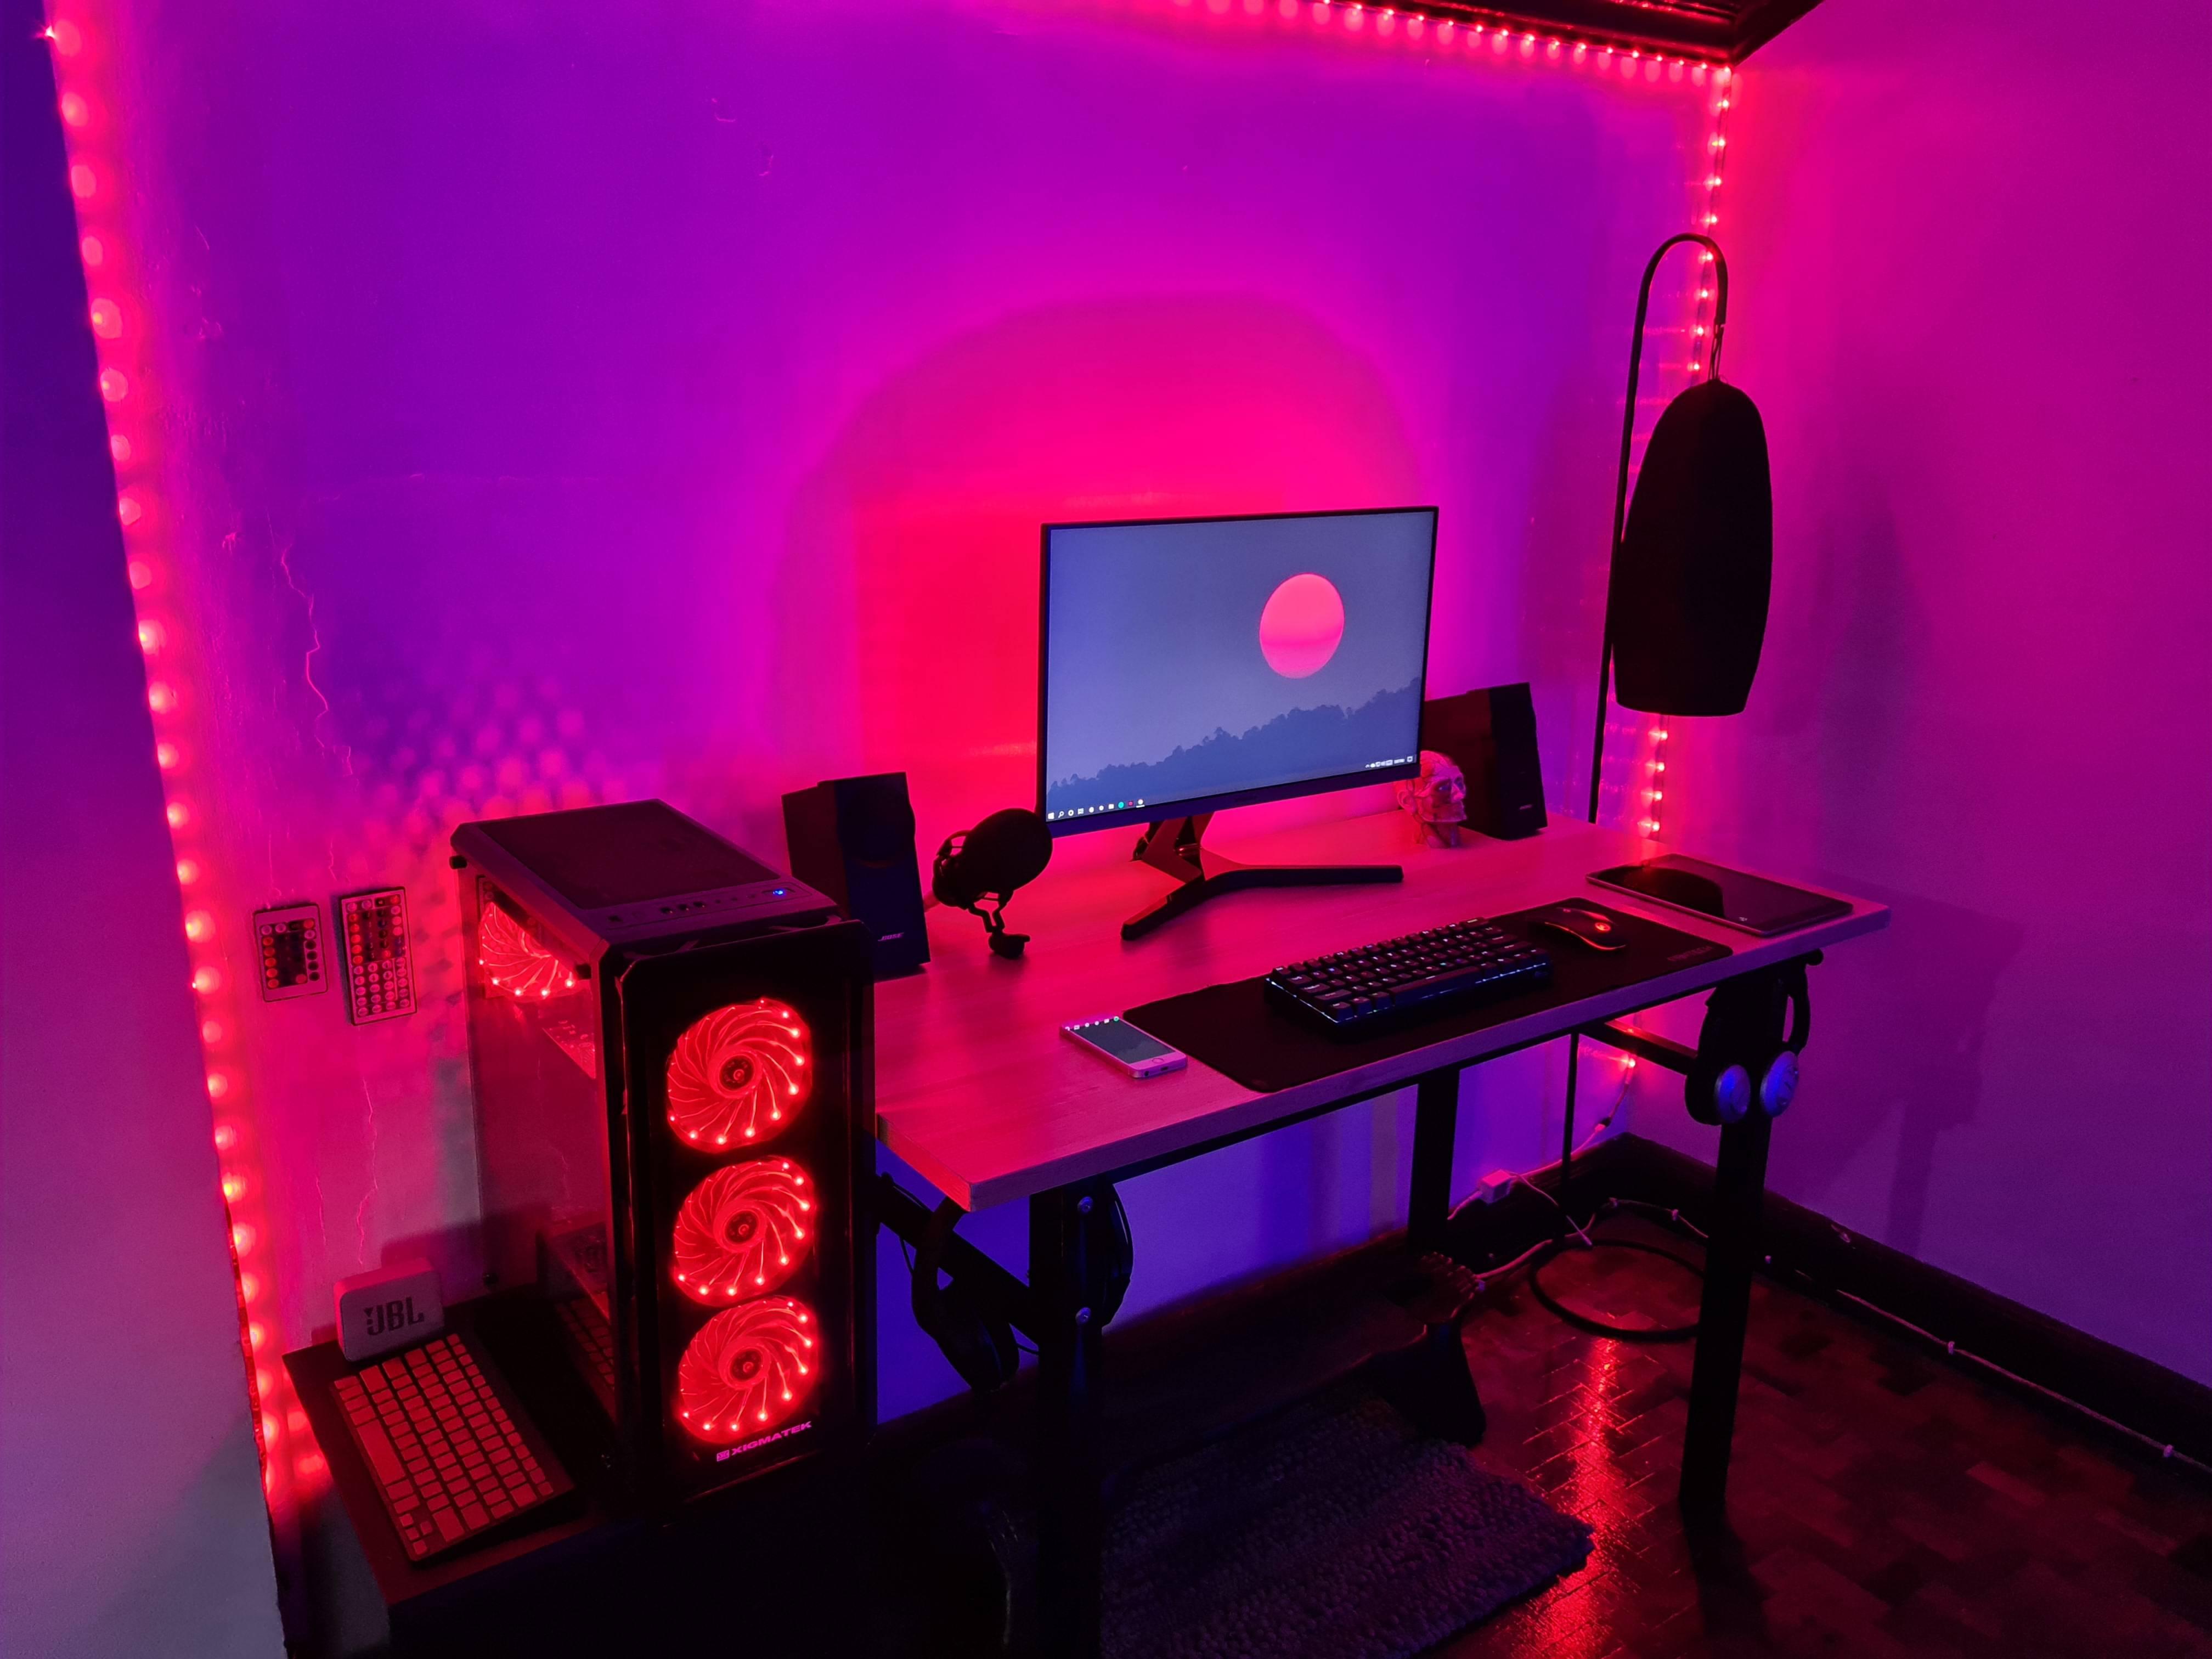 eminforcadela's Setup - Vice City Themed Setup   Scooget